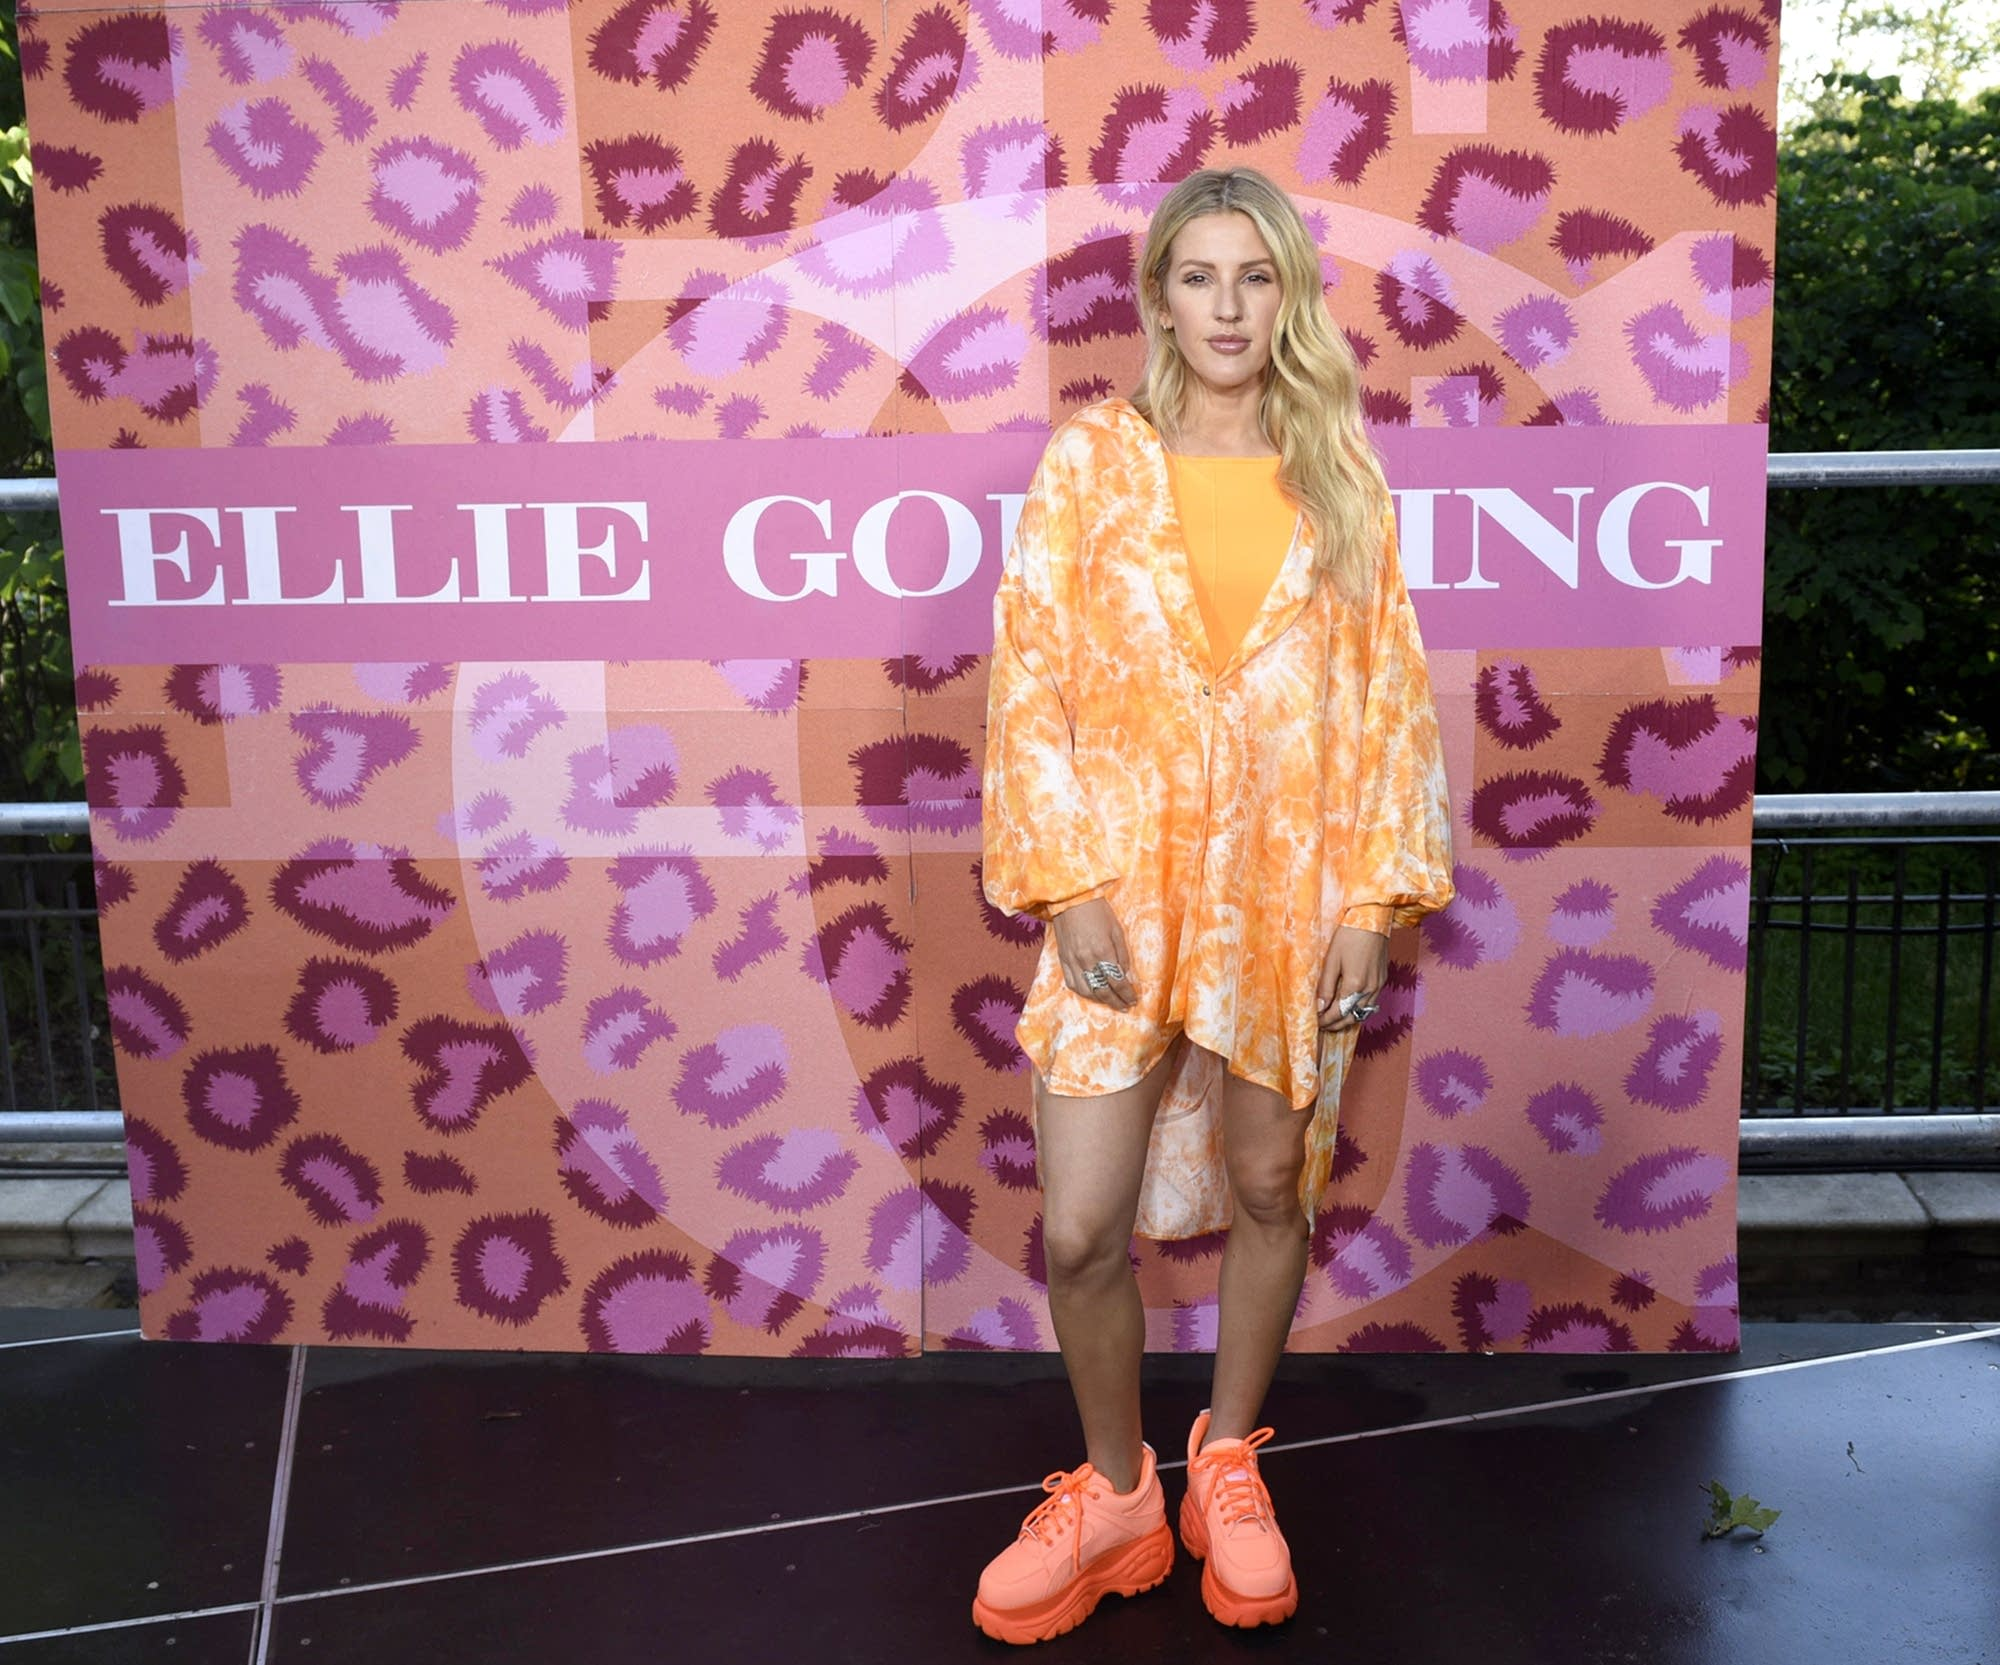 Ellie Goulding on 'Good Morning America' on ABC